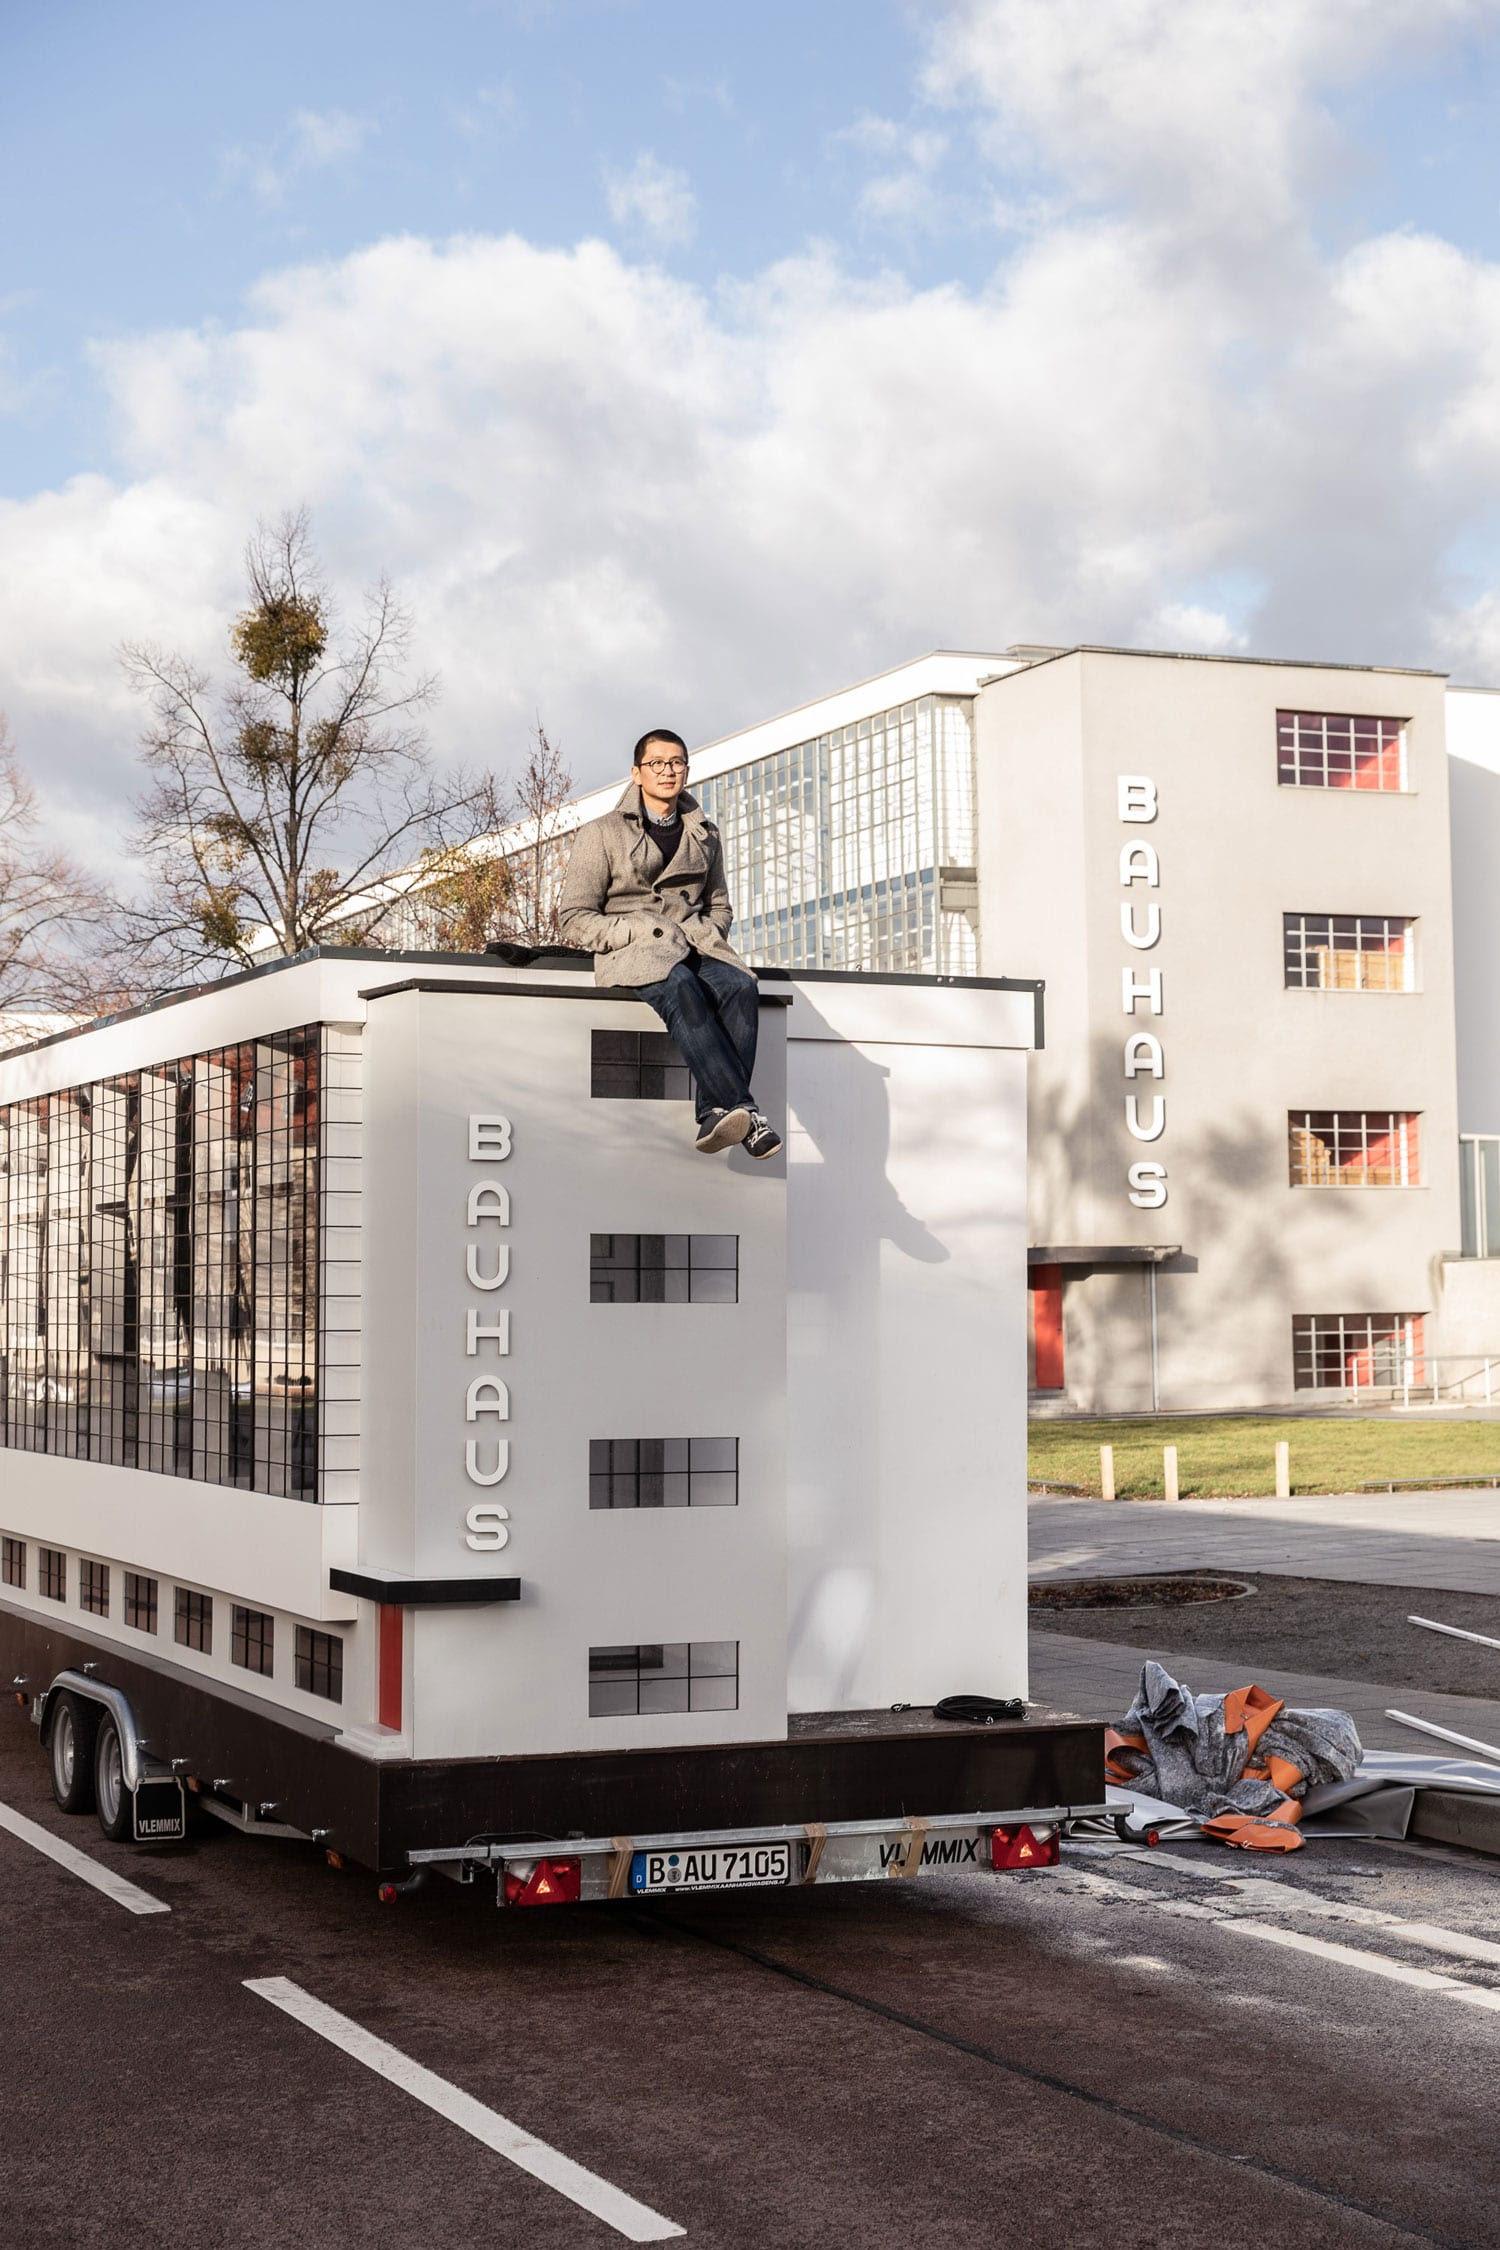 Bauhaus Bus On World Tour In Honour Of The Schools Centennial